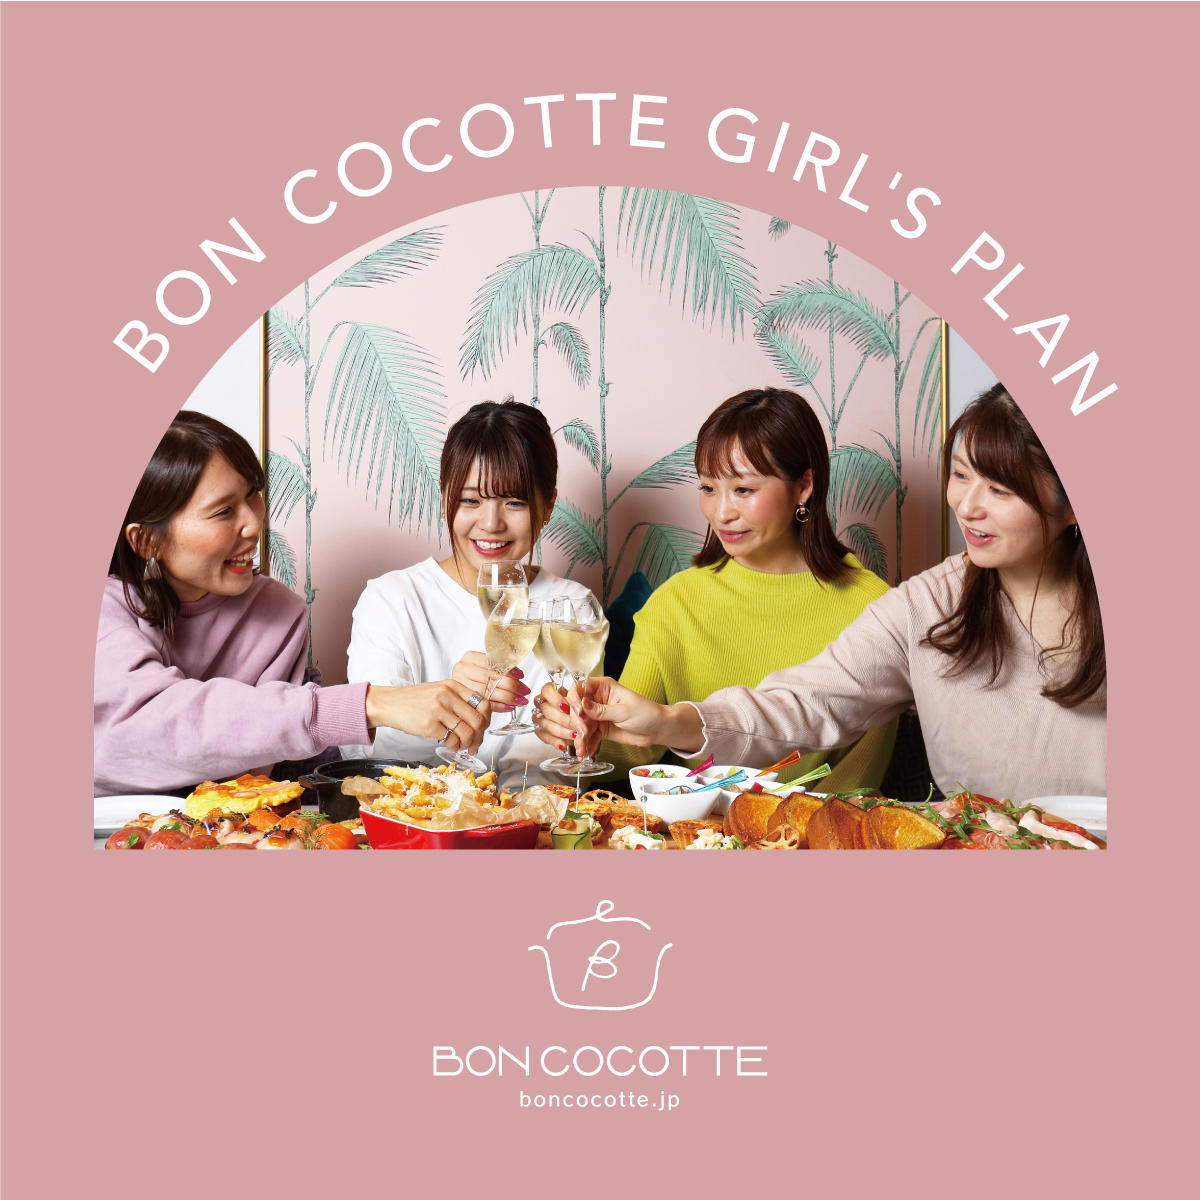 1日2組限定!BON COCOTTE GIRL'S PLAN